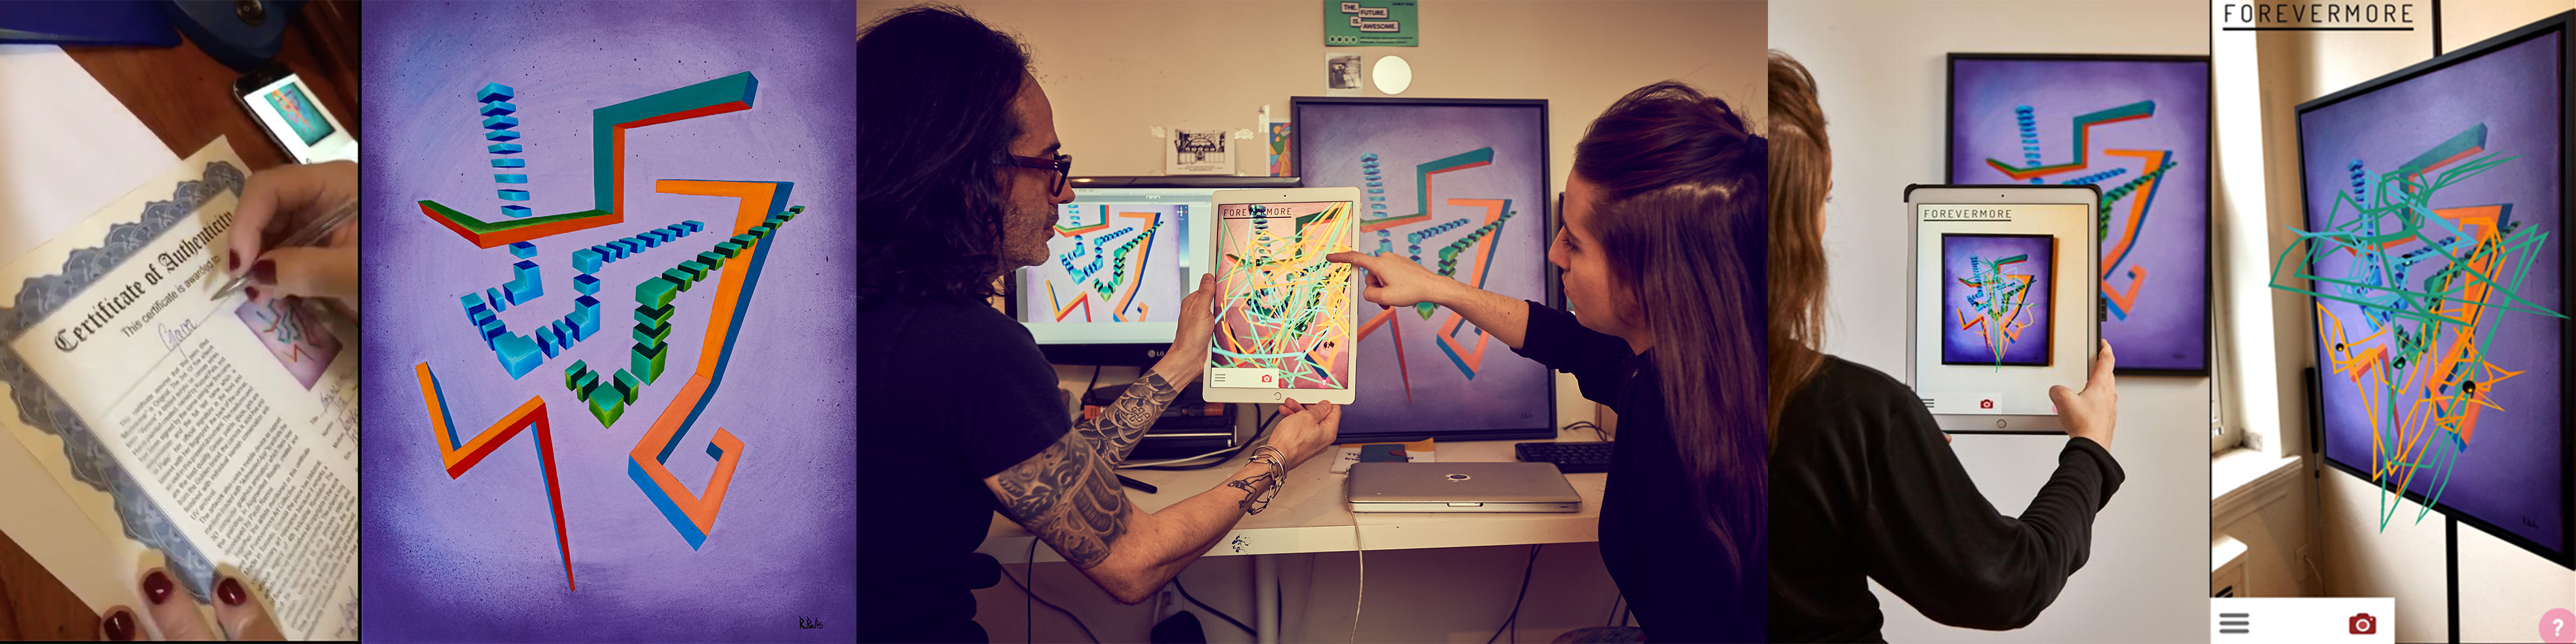 Artist in studio creative art process, Augmented Reality Art, Artist Collector